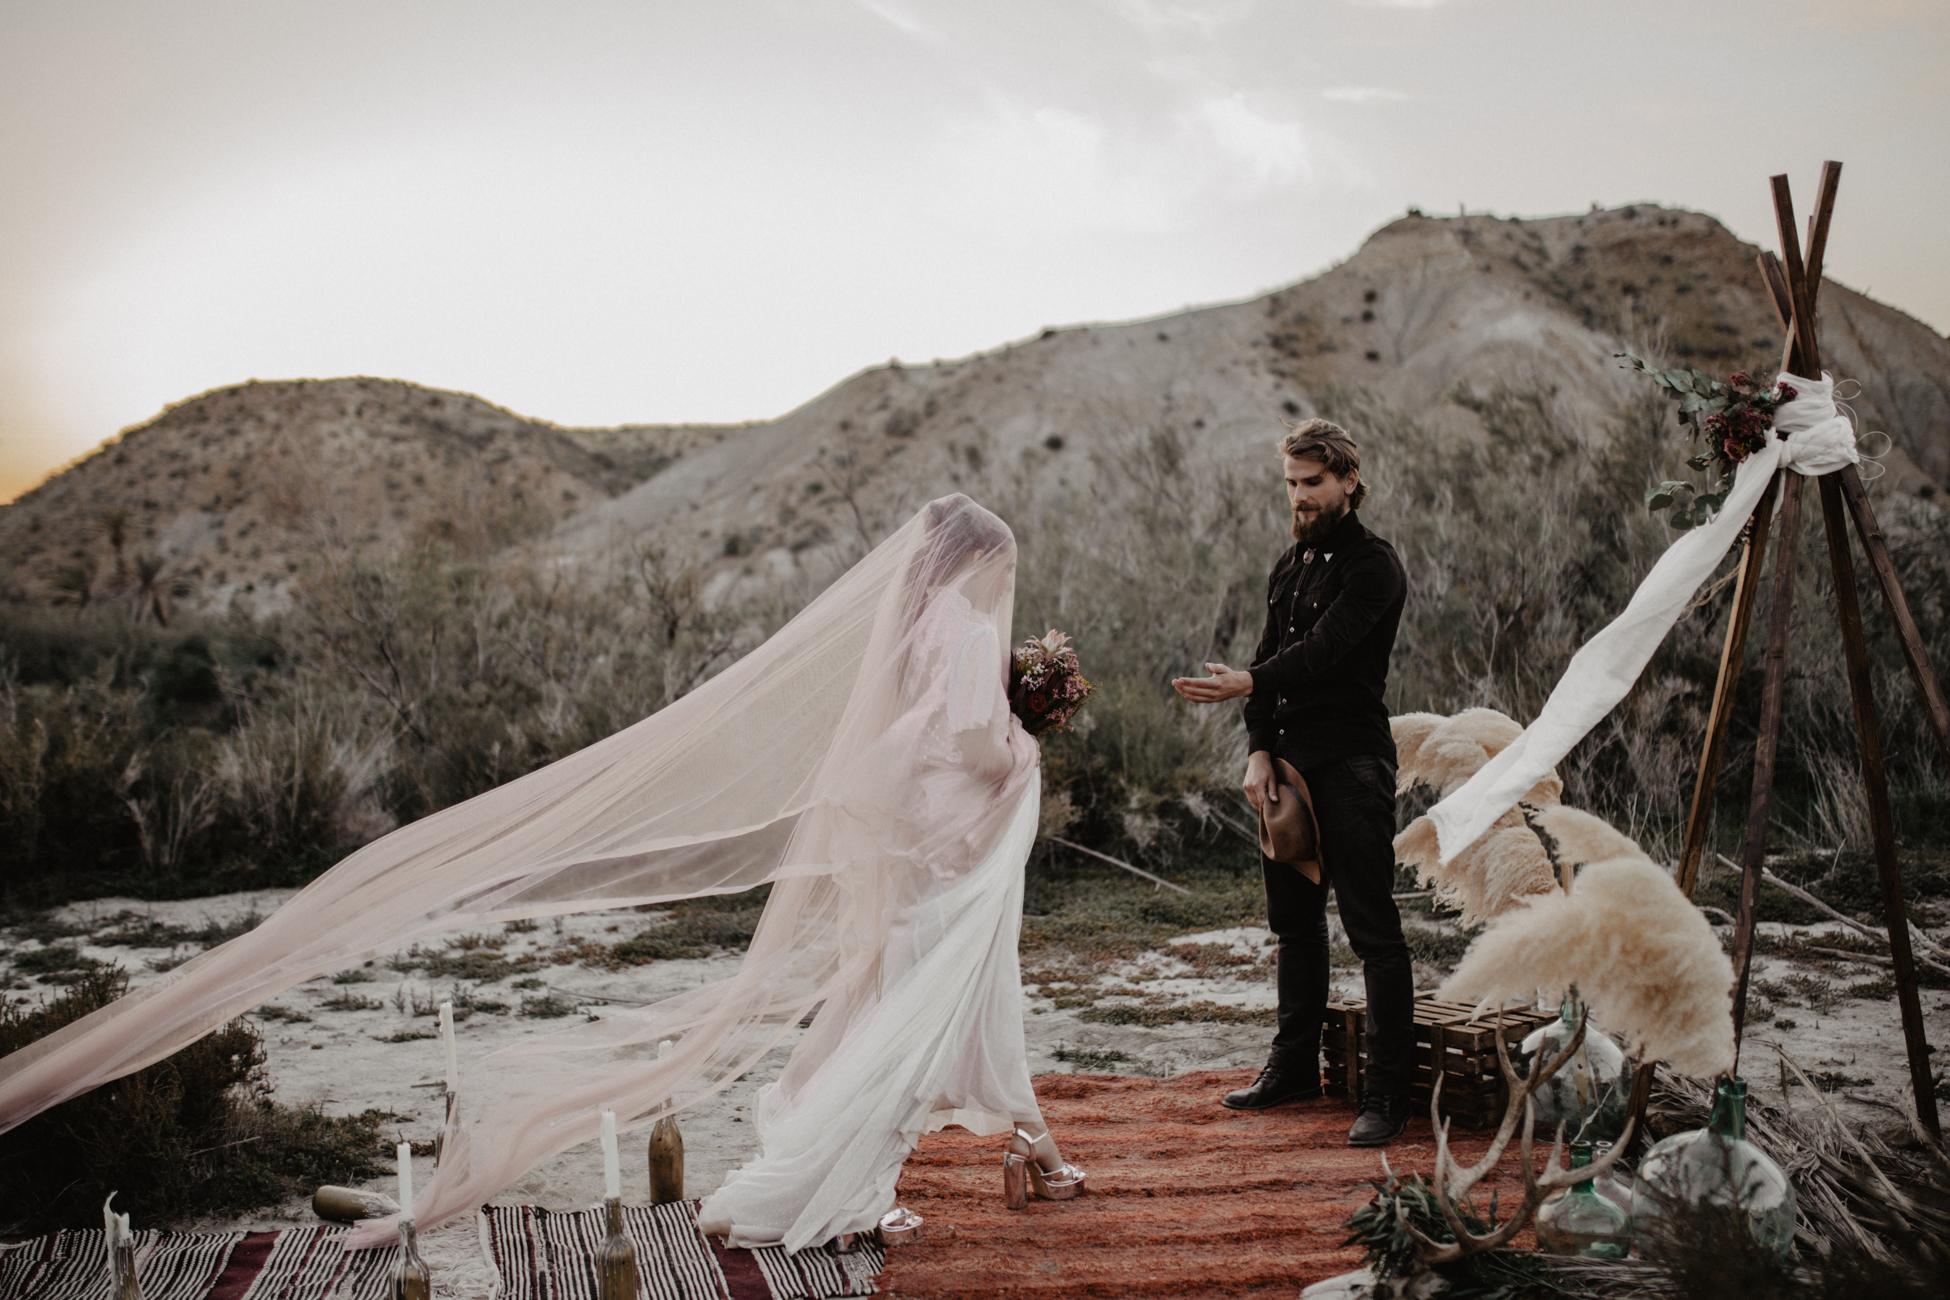 thenortherngirlphotography_photography_thenortherngirl_rebeccascabros_wedding_weddingphotography_weddingphotographer_wood_muebles_deco_bodasdecaramelo_home_bedtime_gaywedding_editorial_desierto_desert_wildestdreams_amortexano-359.jpg